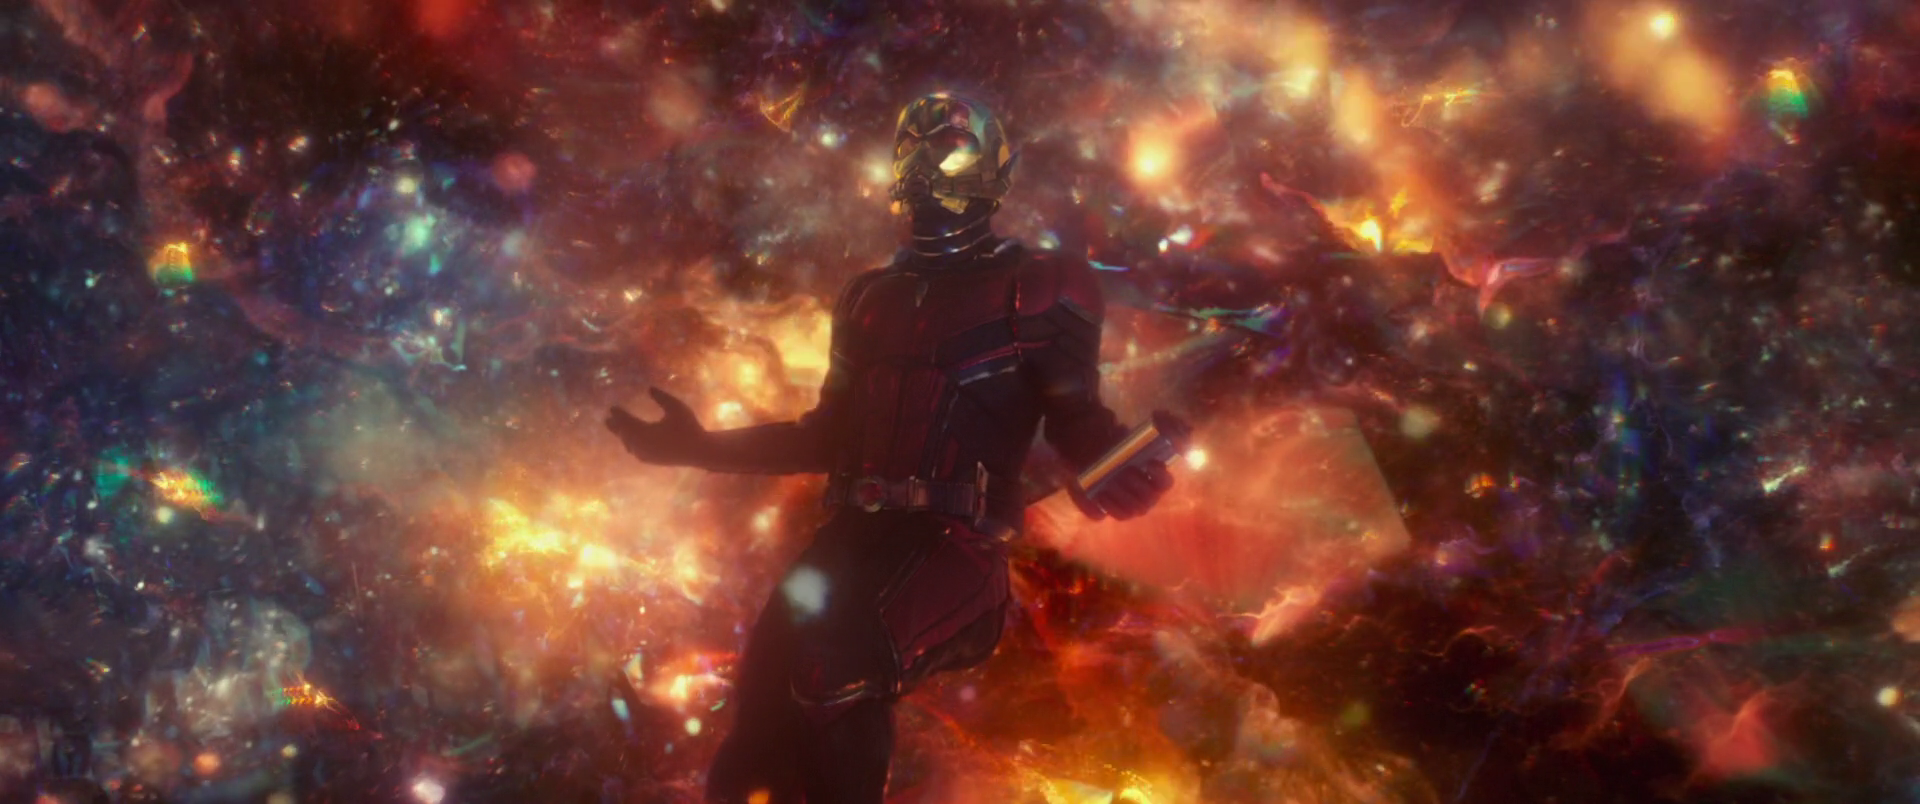 https://s.newsweek.com/sites/www.newsweek.com/files/styles/full/public/2018/11/08/ant-man-quantum-realm-avengers-4.png